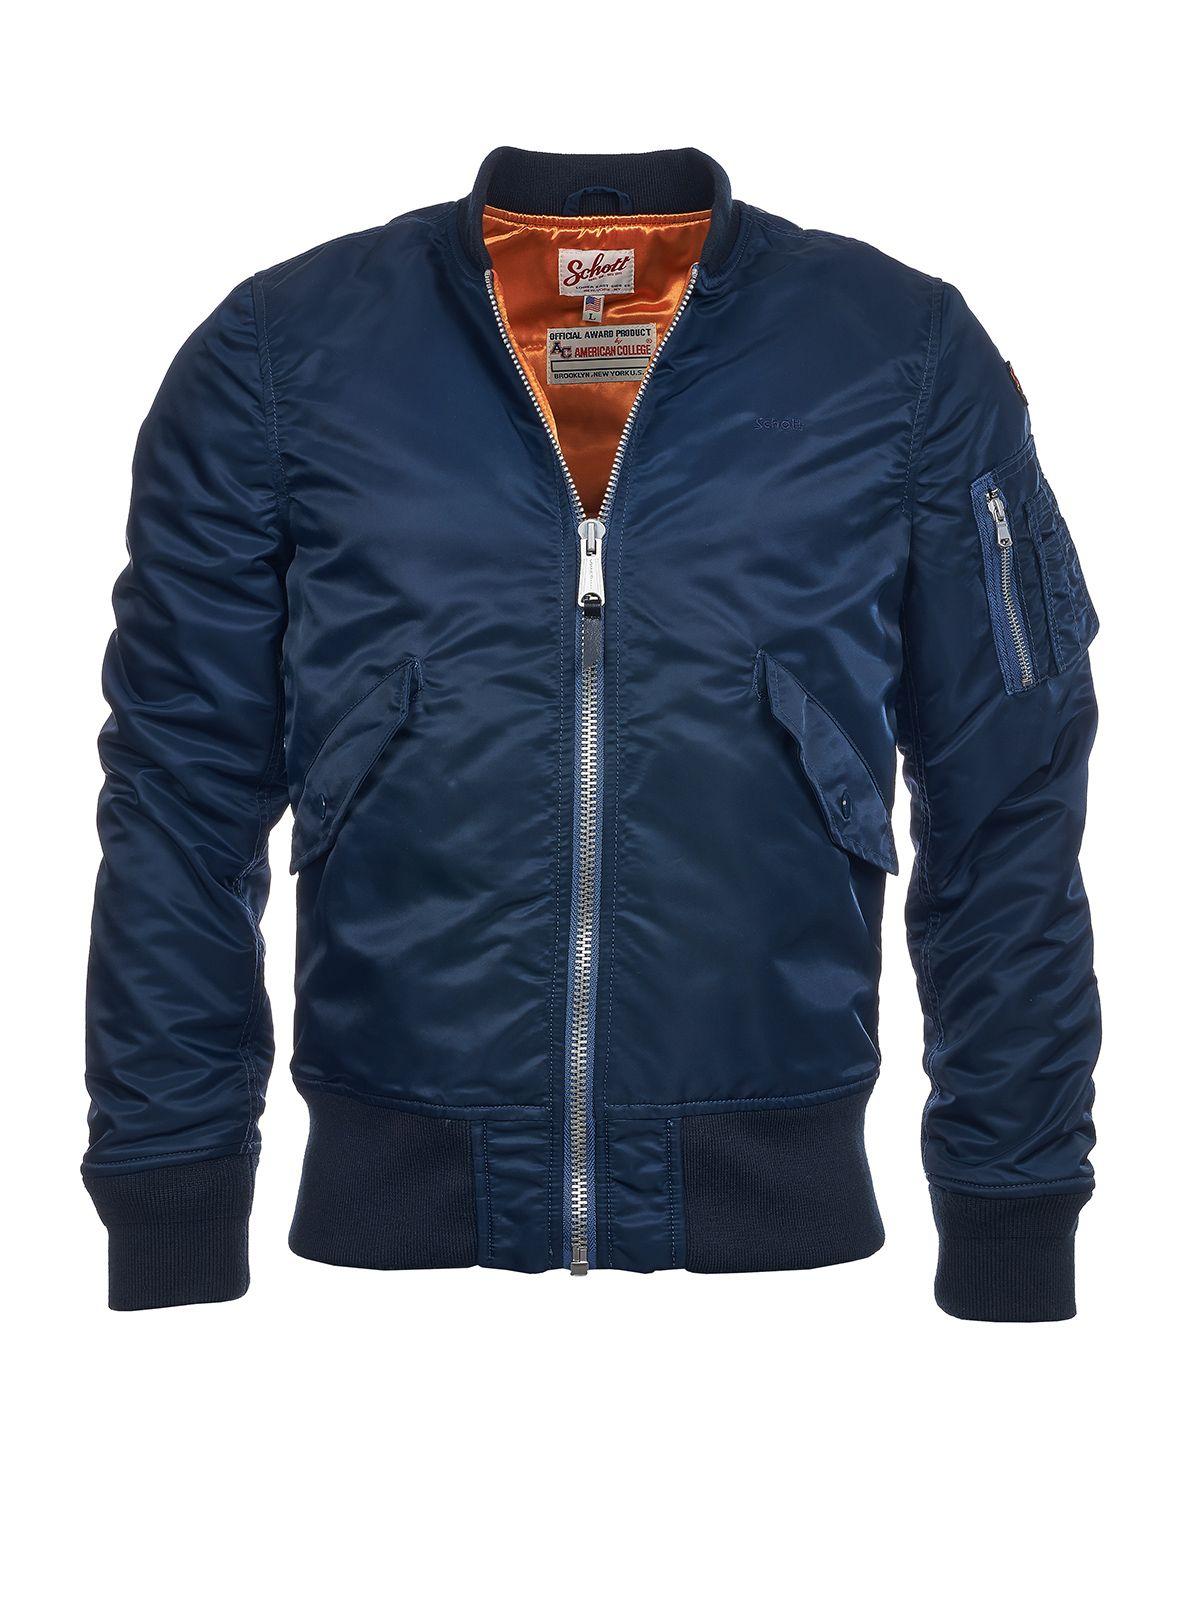 Pin By Jay Yeadon On Military Pinterest Jackets Navy Bomber Jaket Boomber Blue Men Jacket Coats Mens Dress